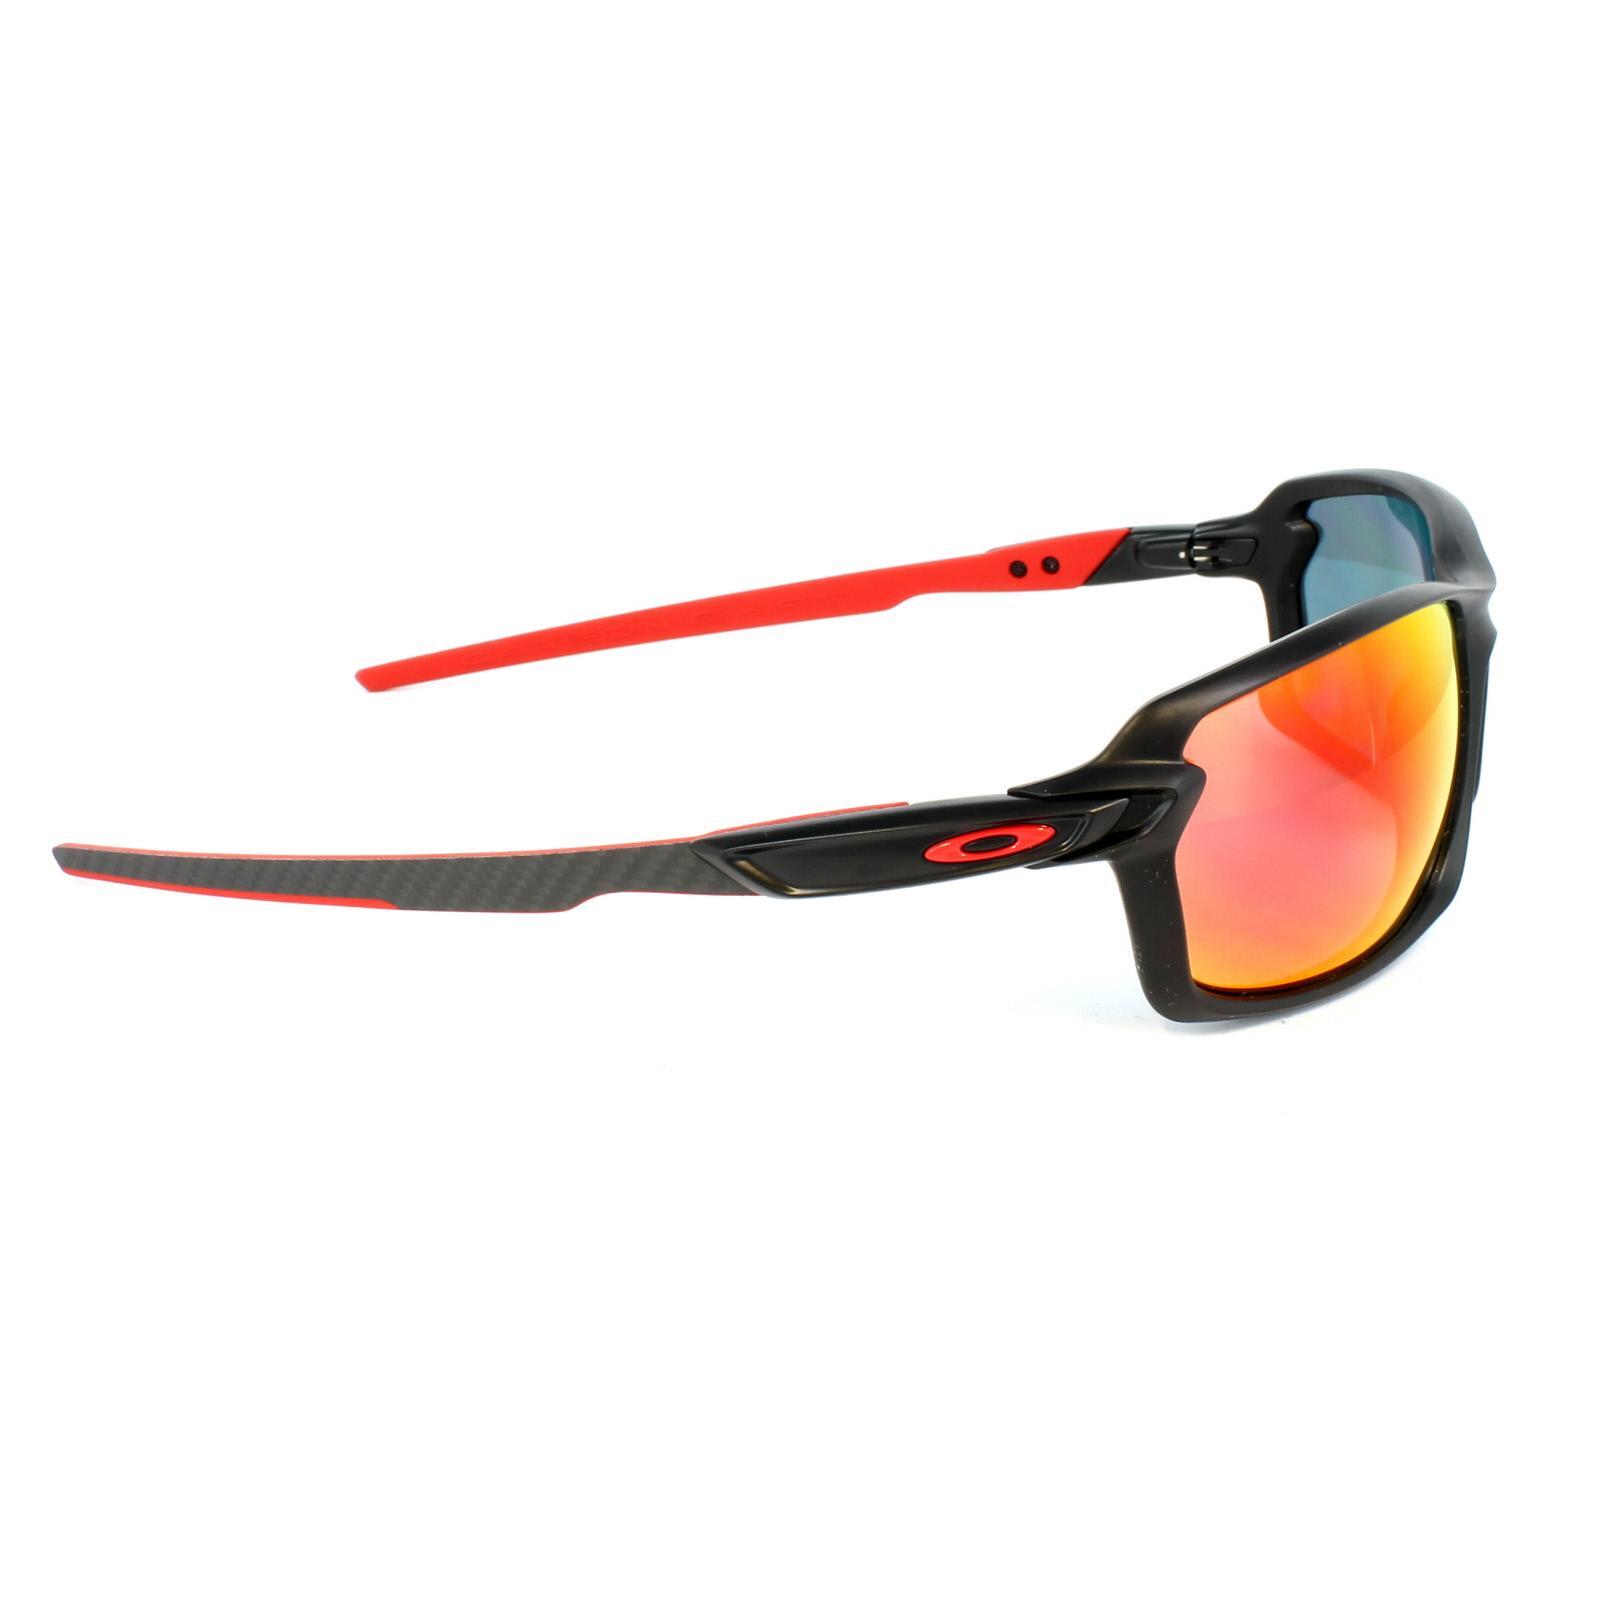 fd442a7c92 Cheap Oakley Carbon Shift Sunglasses - Discounted Sunglasses